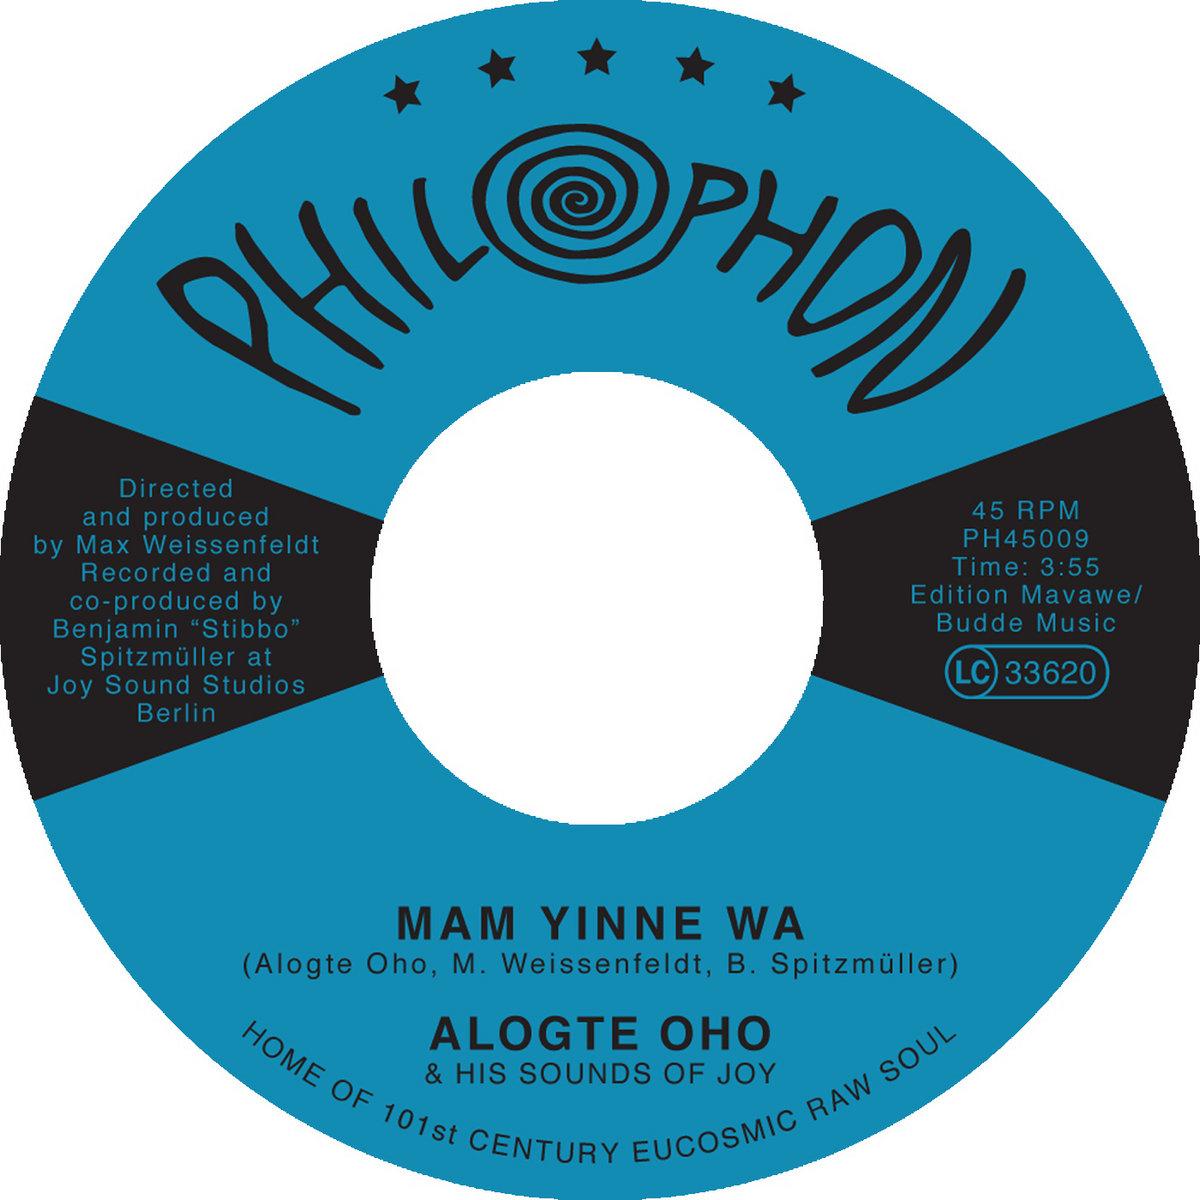 mam yinne wa alogte oho and his sounds of joy